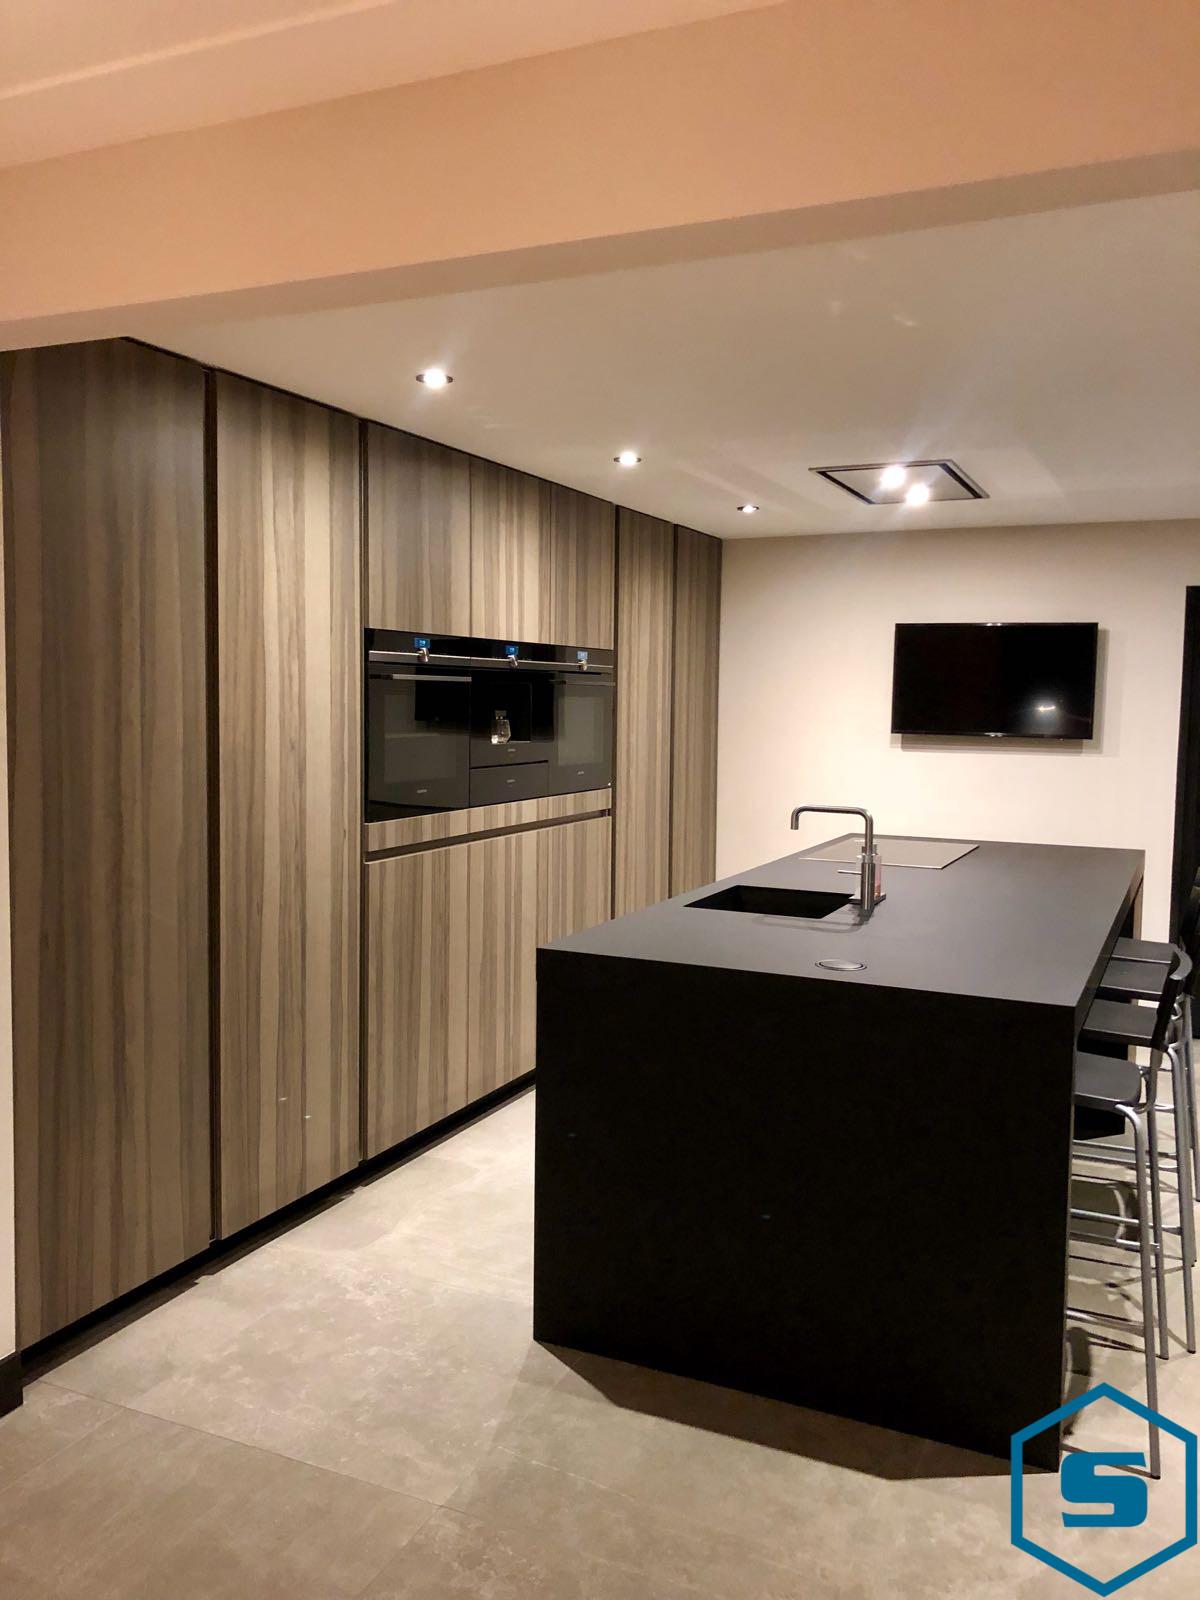 Stabilo-interieurbouw-keuken-met-kookeiland-shinnoki-fenix-1